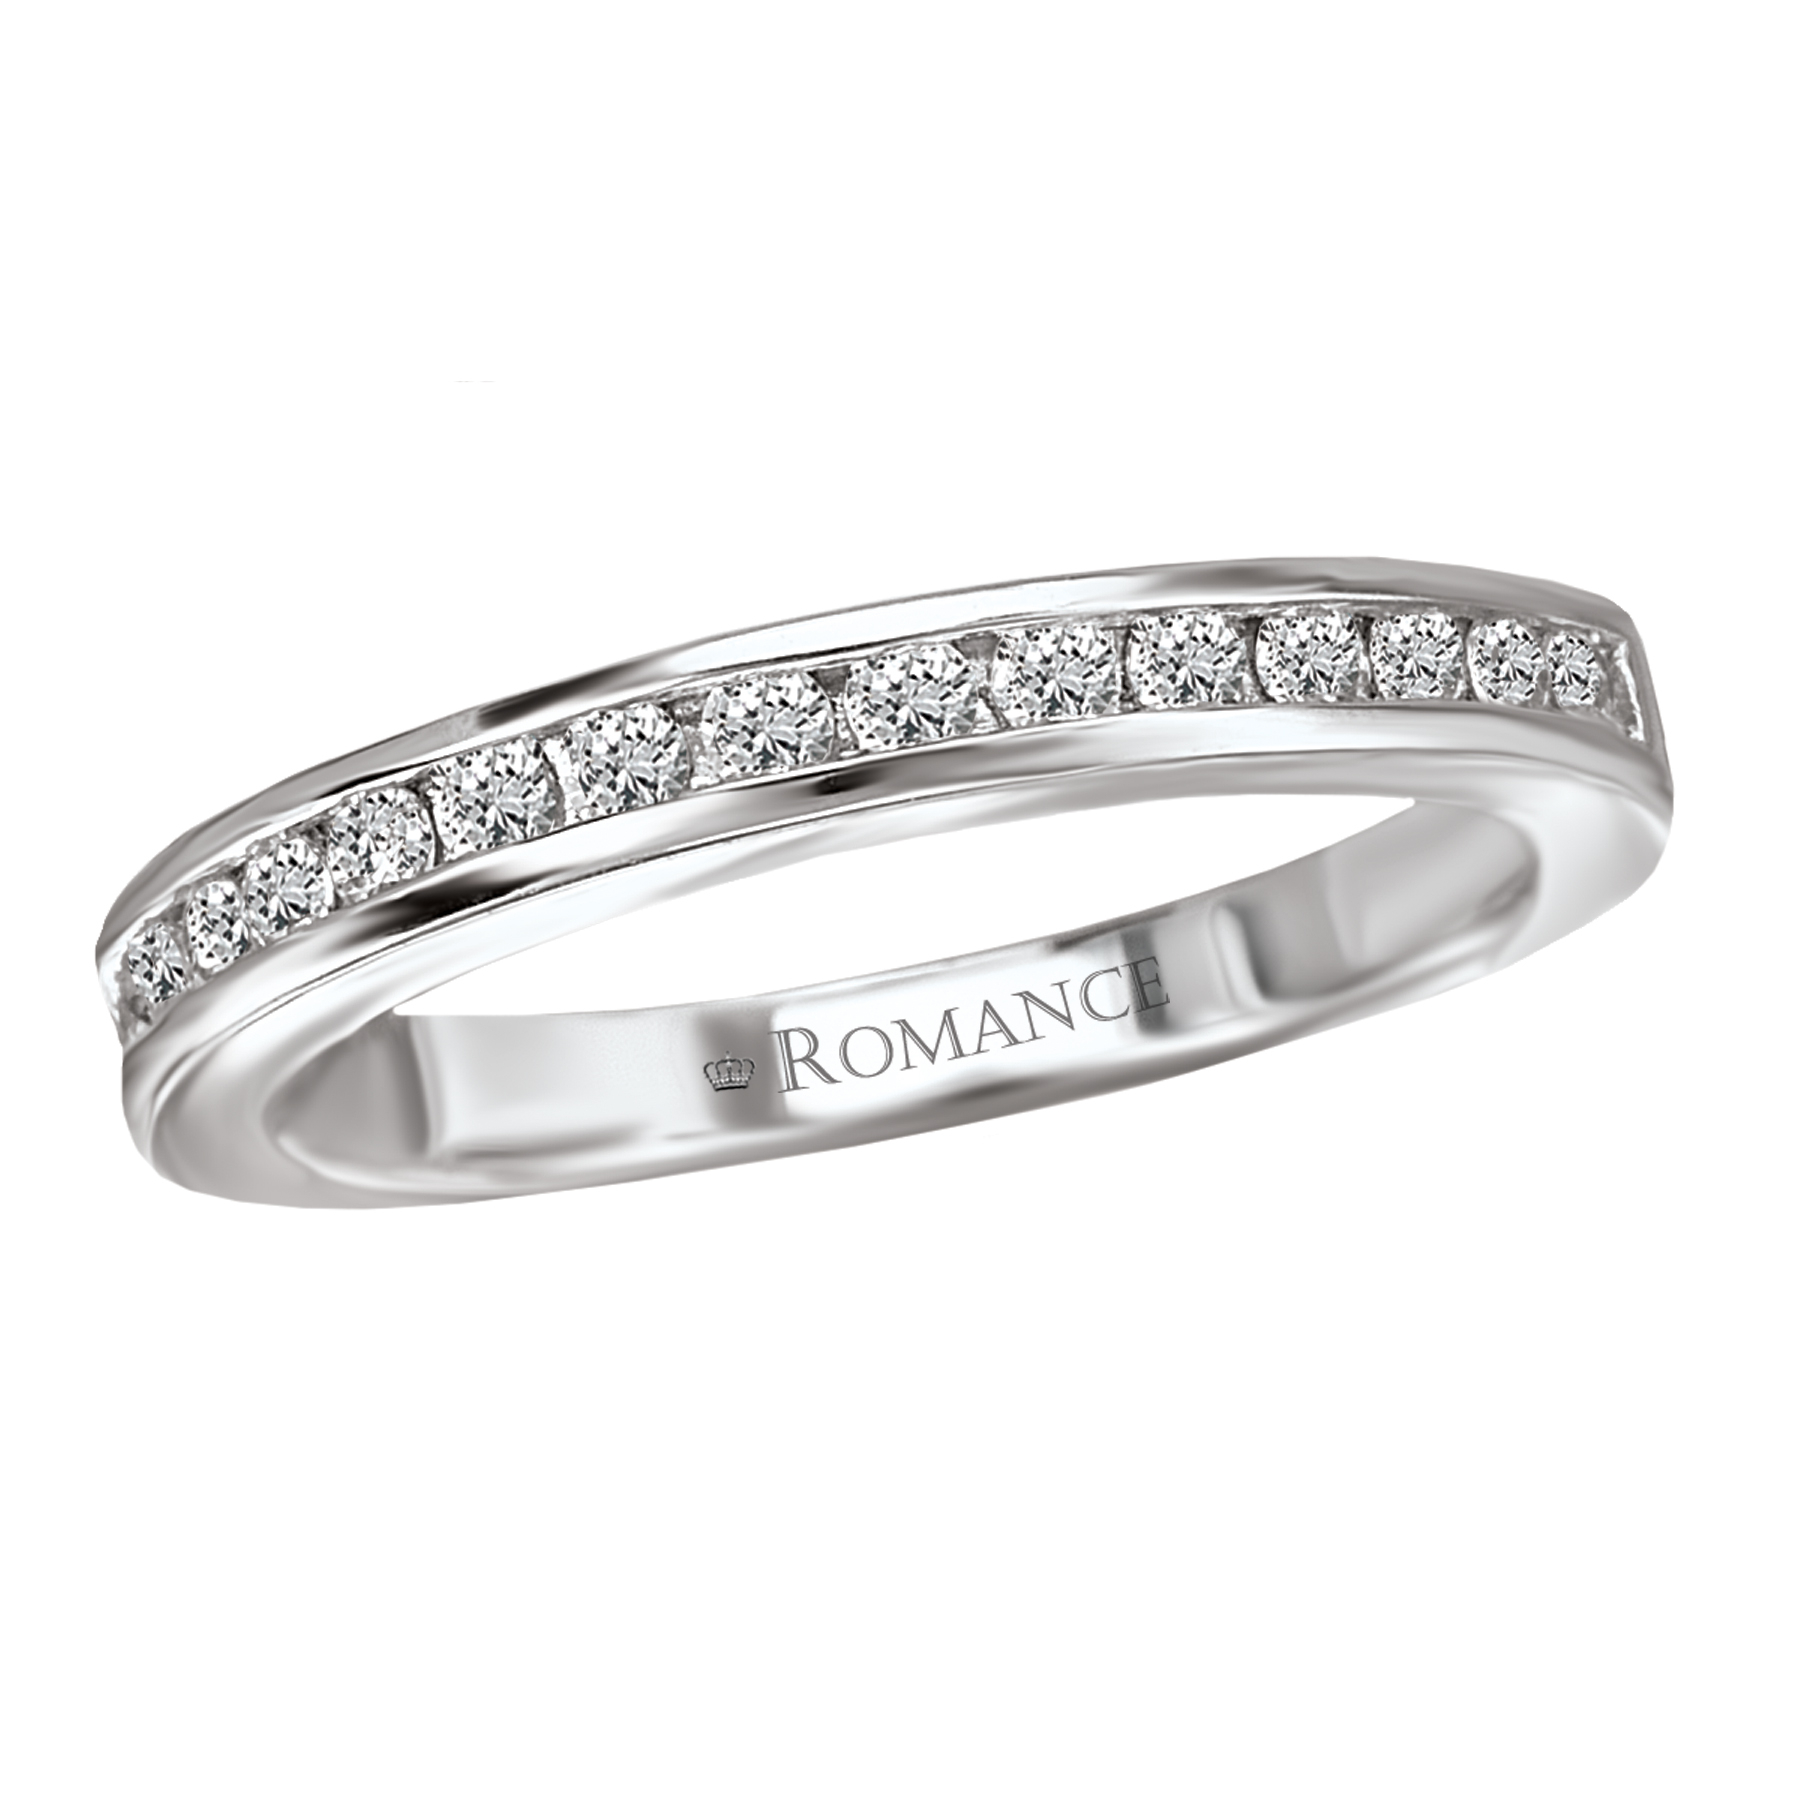 Romance Wedding Bands 117452-W product image